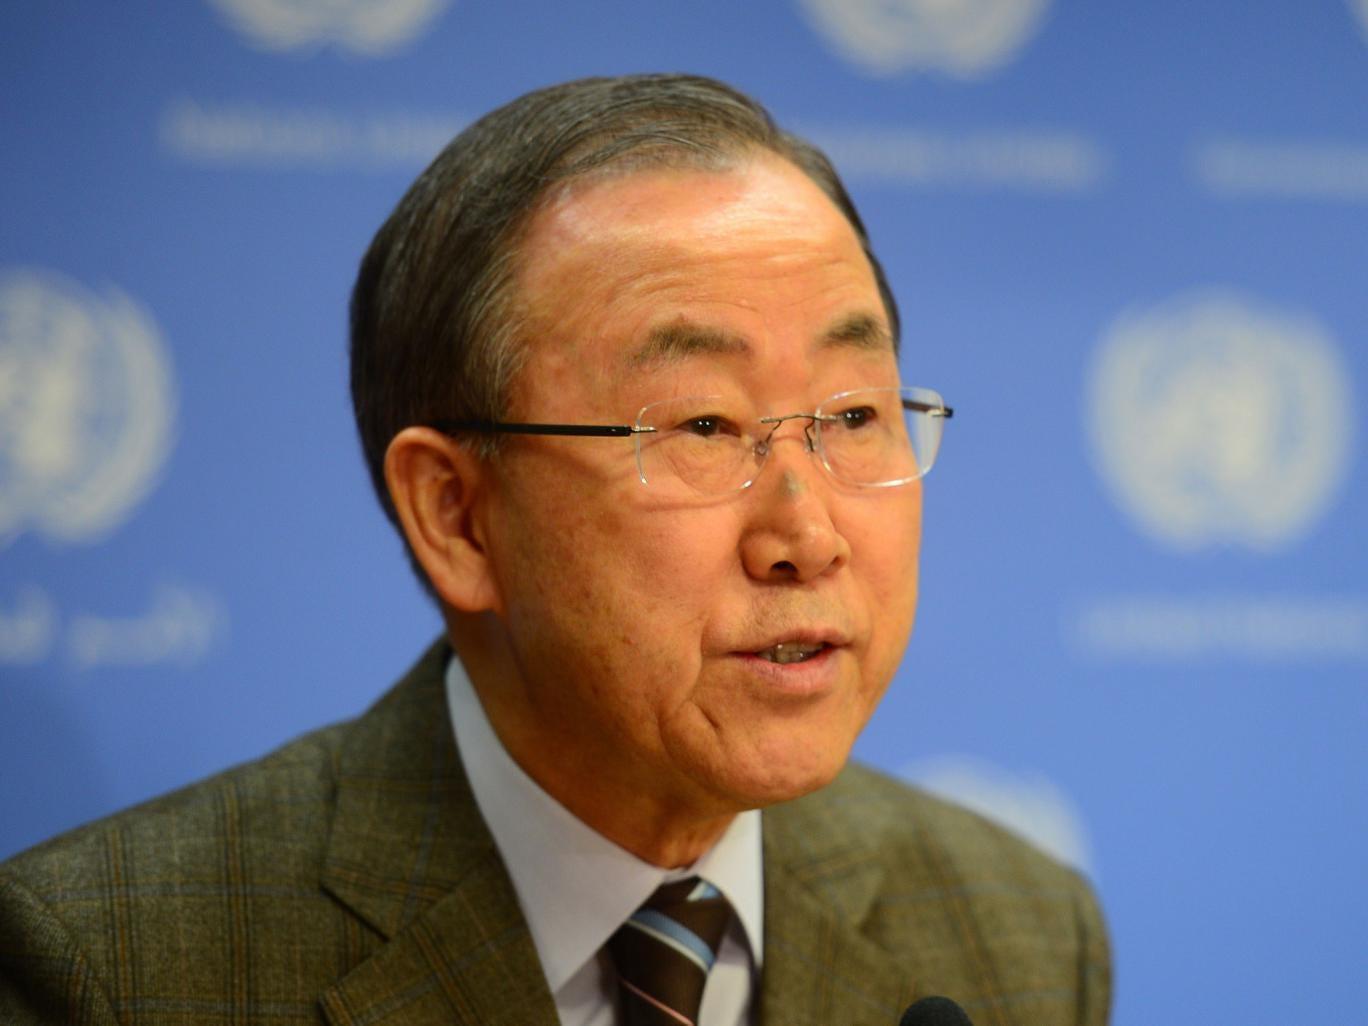 Ban Ki-Moon will travel to the region today to talk to representatives from Israel and Hamas